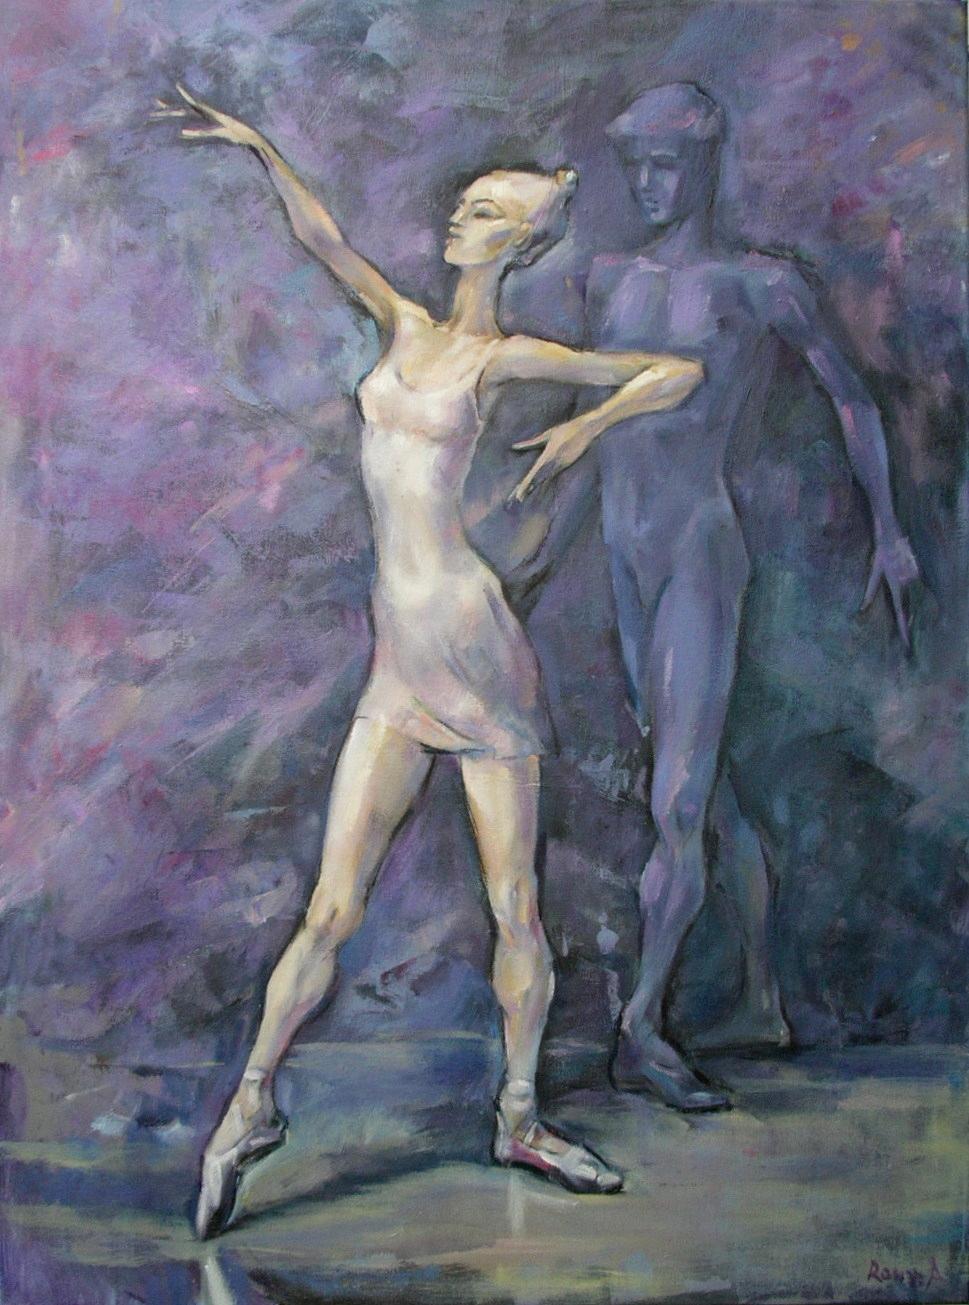 Roussana Alex-Nowakowska Taniec ol. płótno 60- 80sm